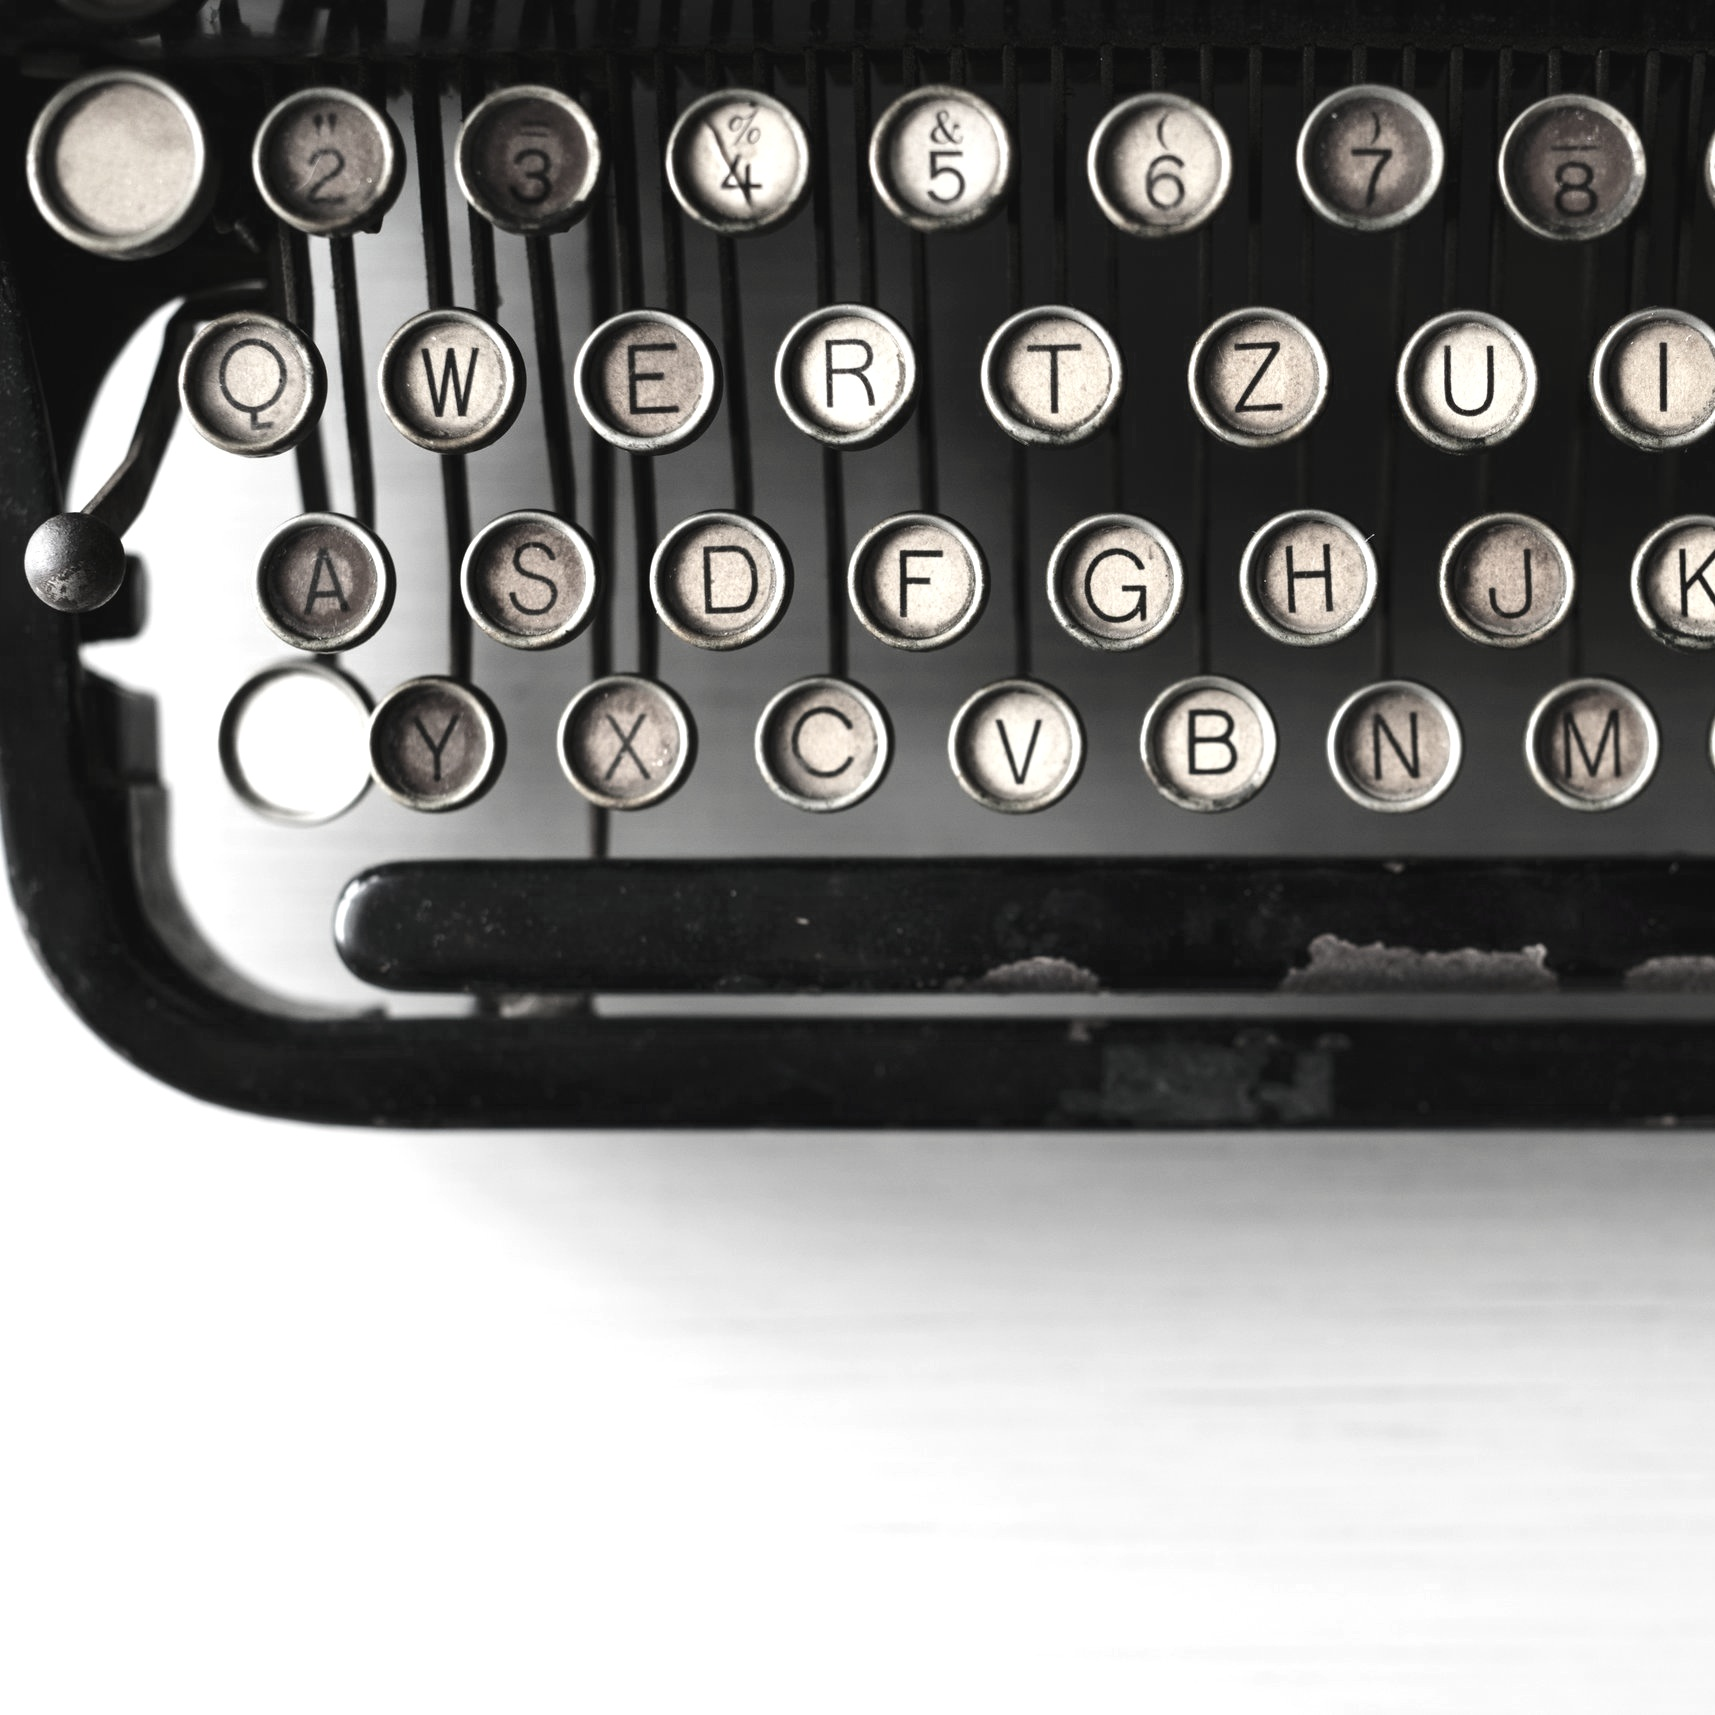 typewriter-unsplash.jpg